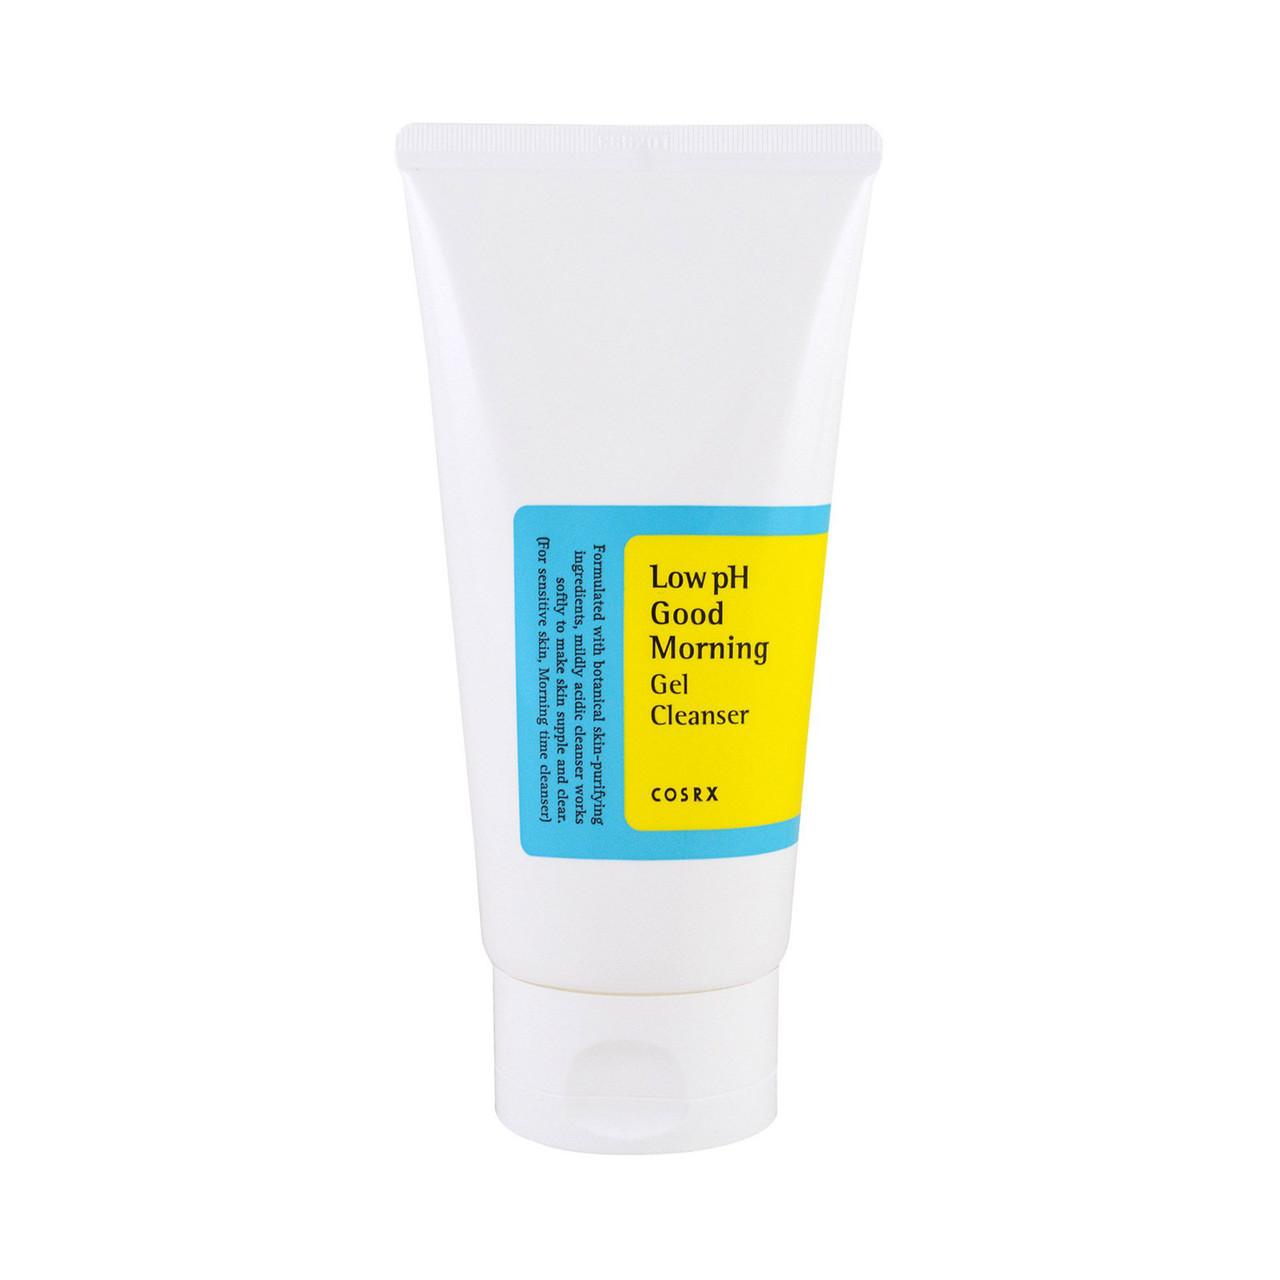 COSRX Low pH Good Morning Gel Cleanser Мягкий гель для умывания